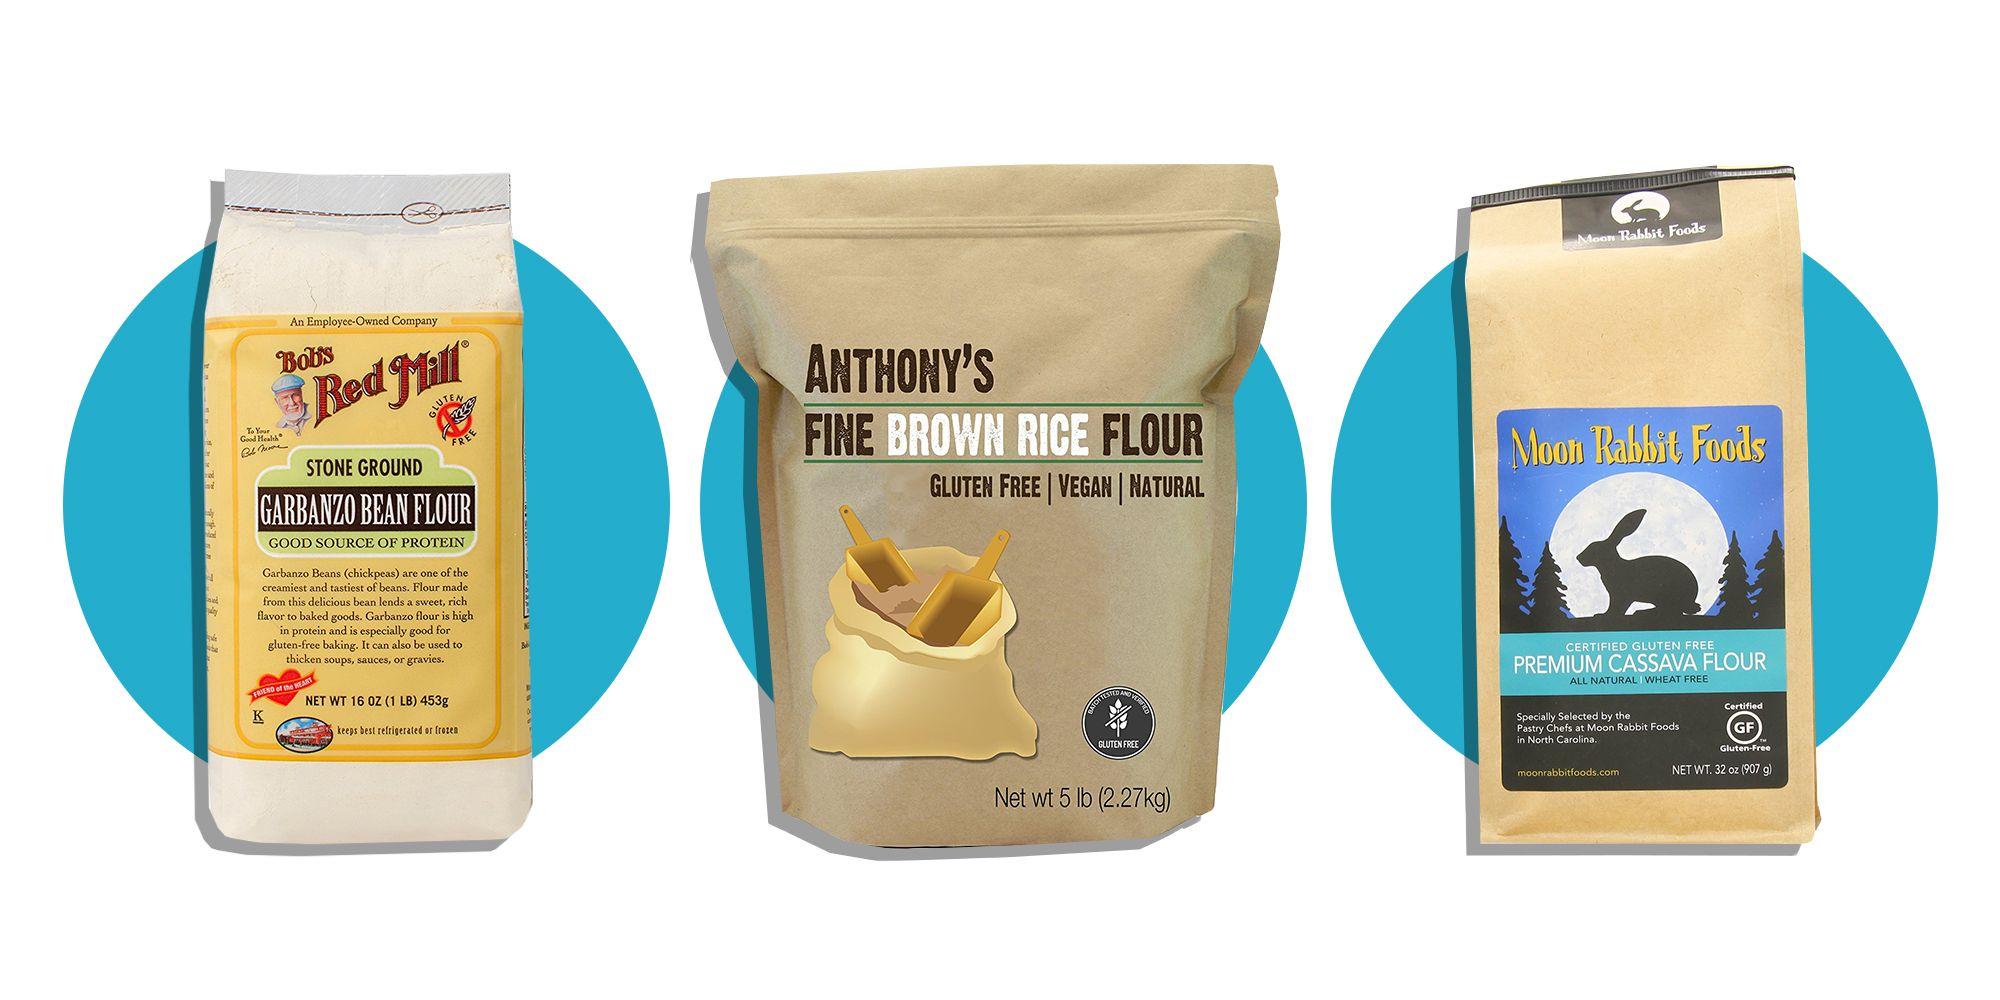 10 Best Gluten Free Flours Of 2018 Organic And Gluten Free Baking Flour